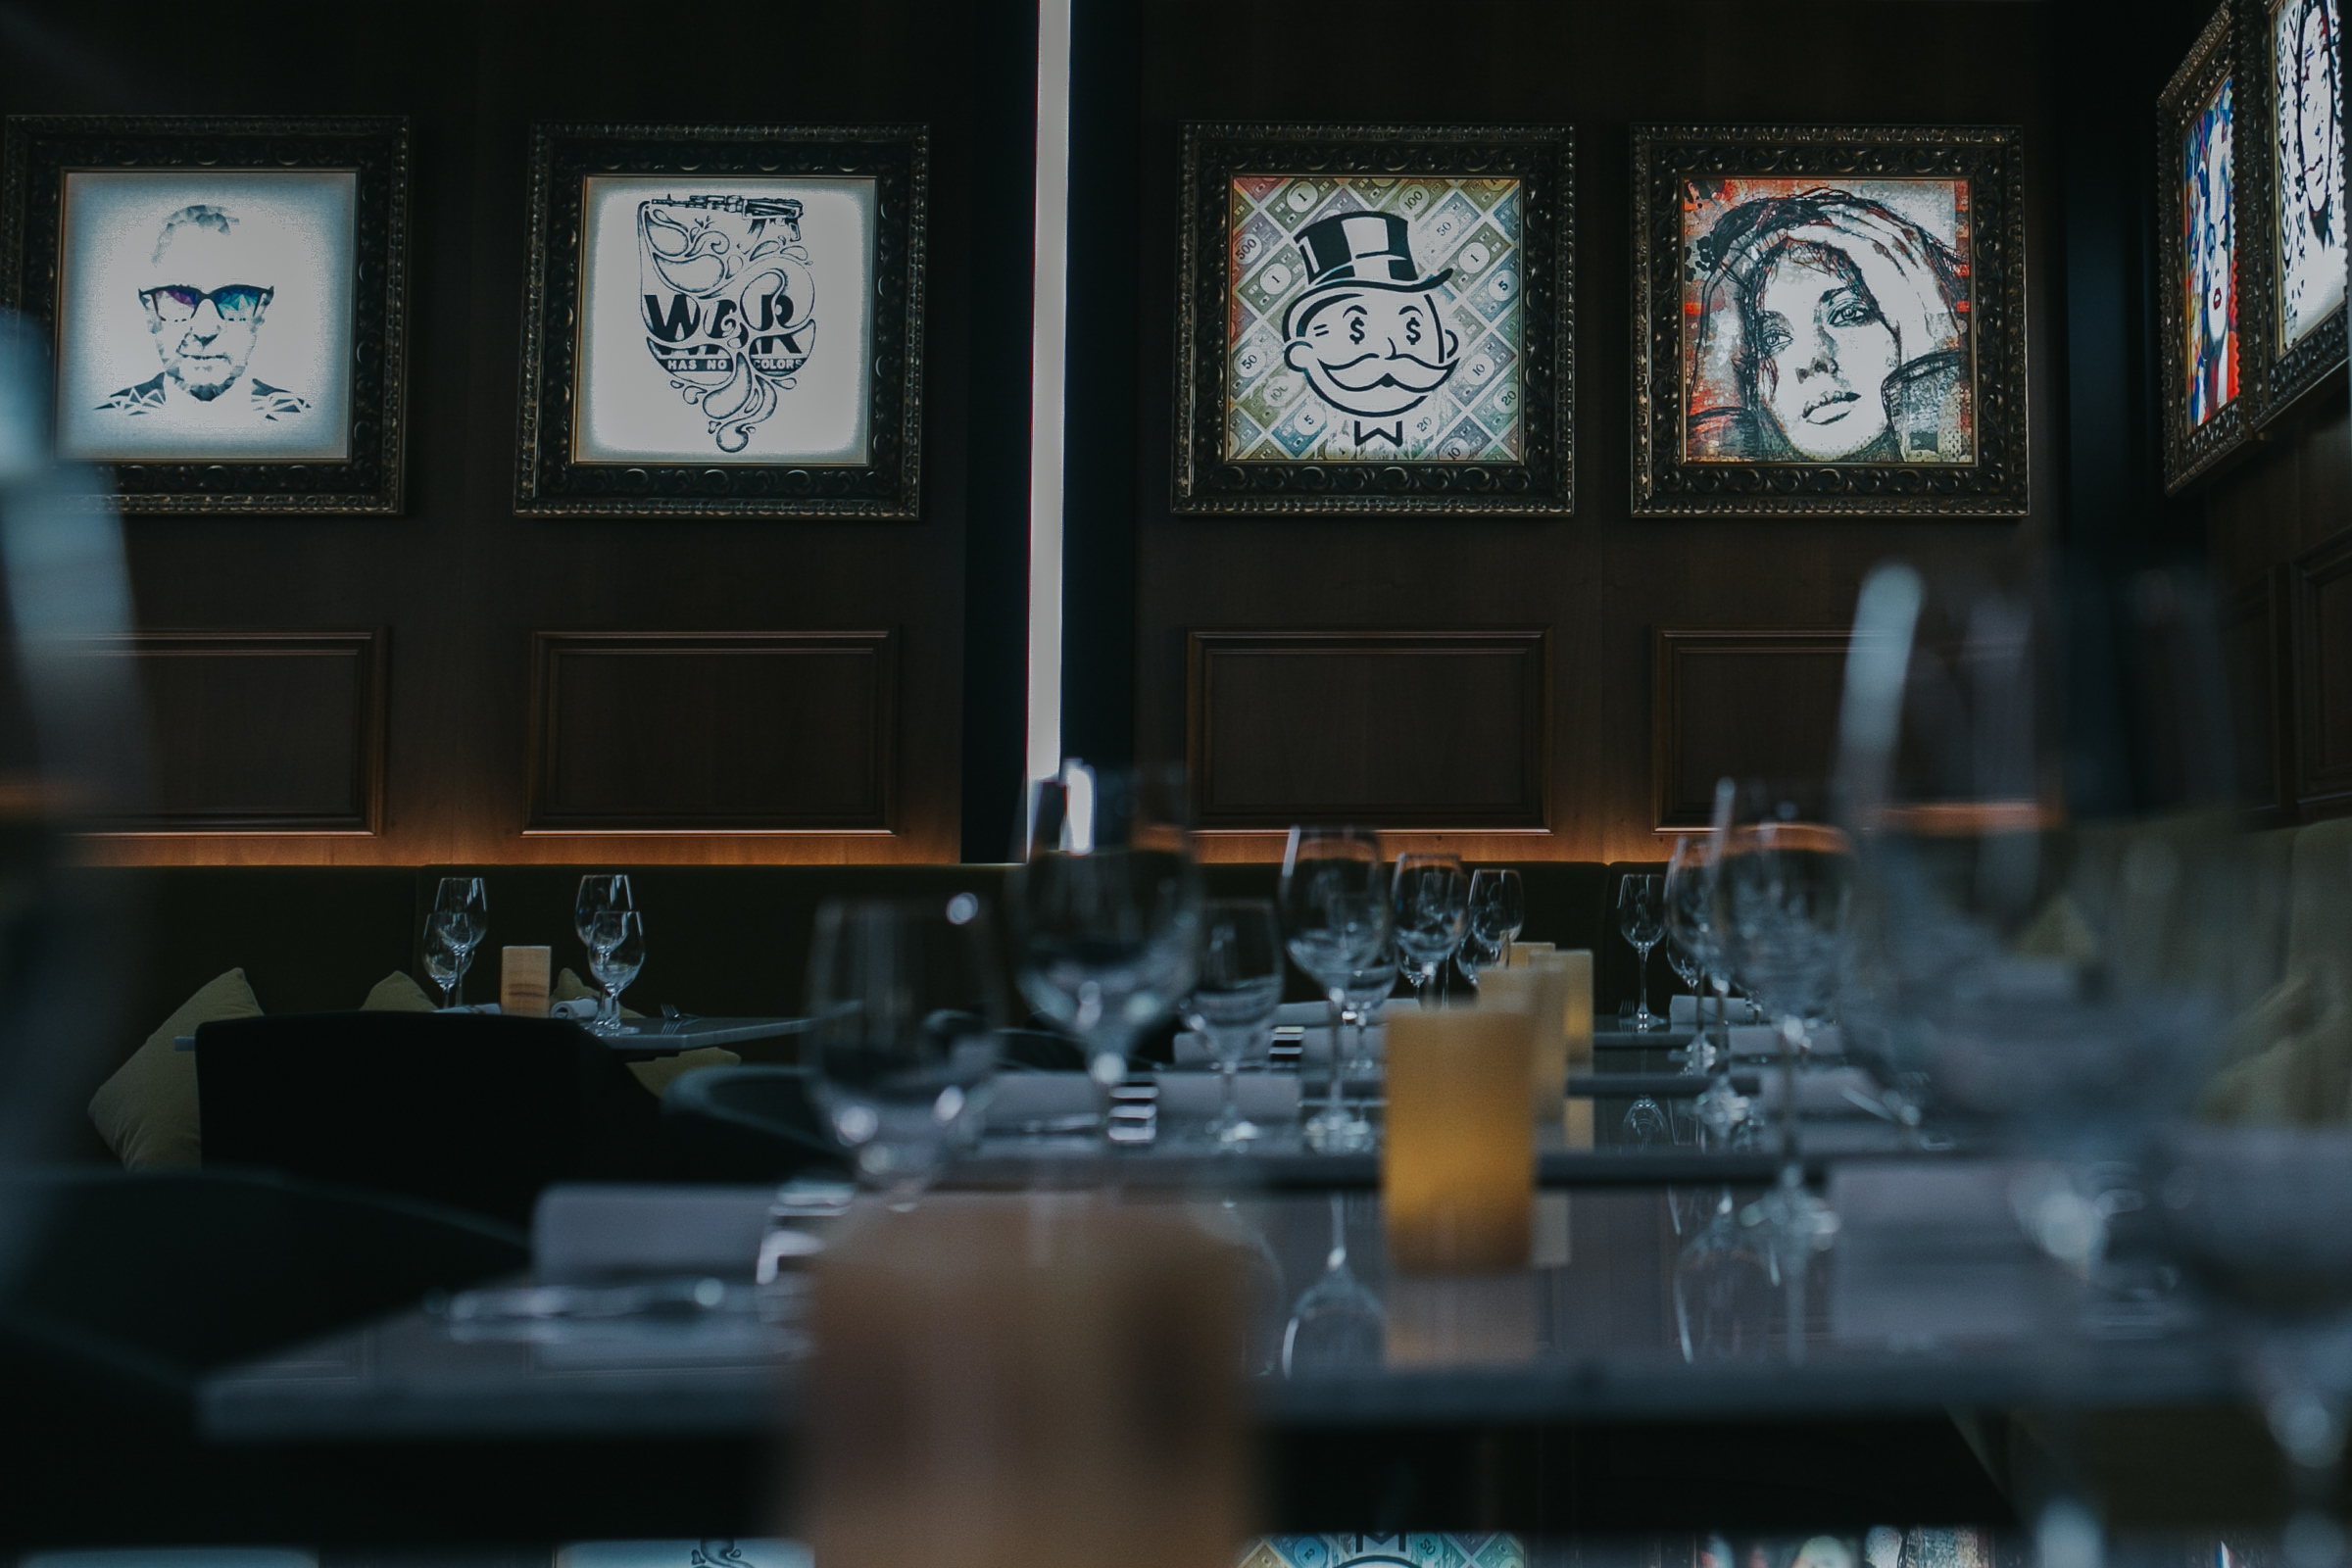 Caramel-restaurant-and-lounge-london-abu-dabi-dubai-oman-new-restaurant-in-london-minas-planet-review-jasmina-haskovic6.jpg